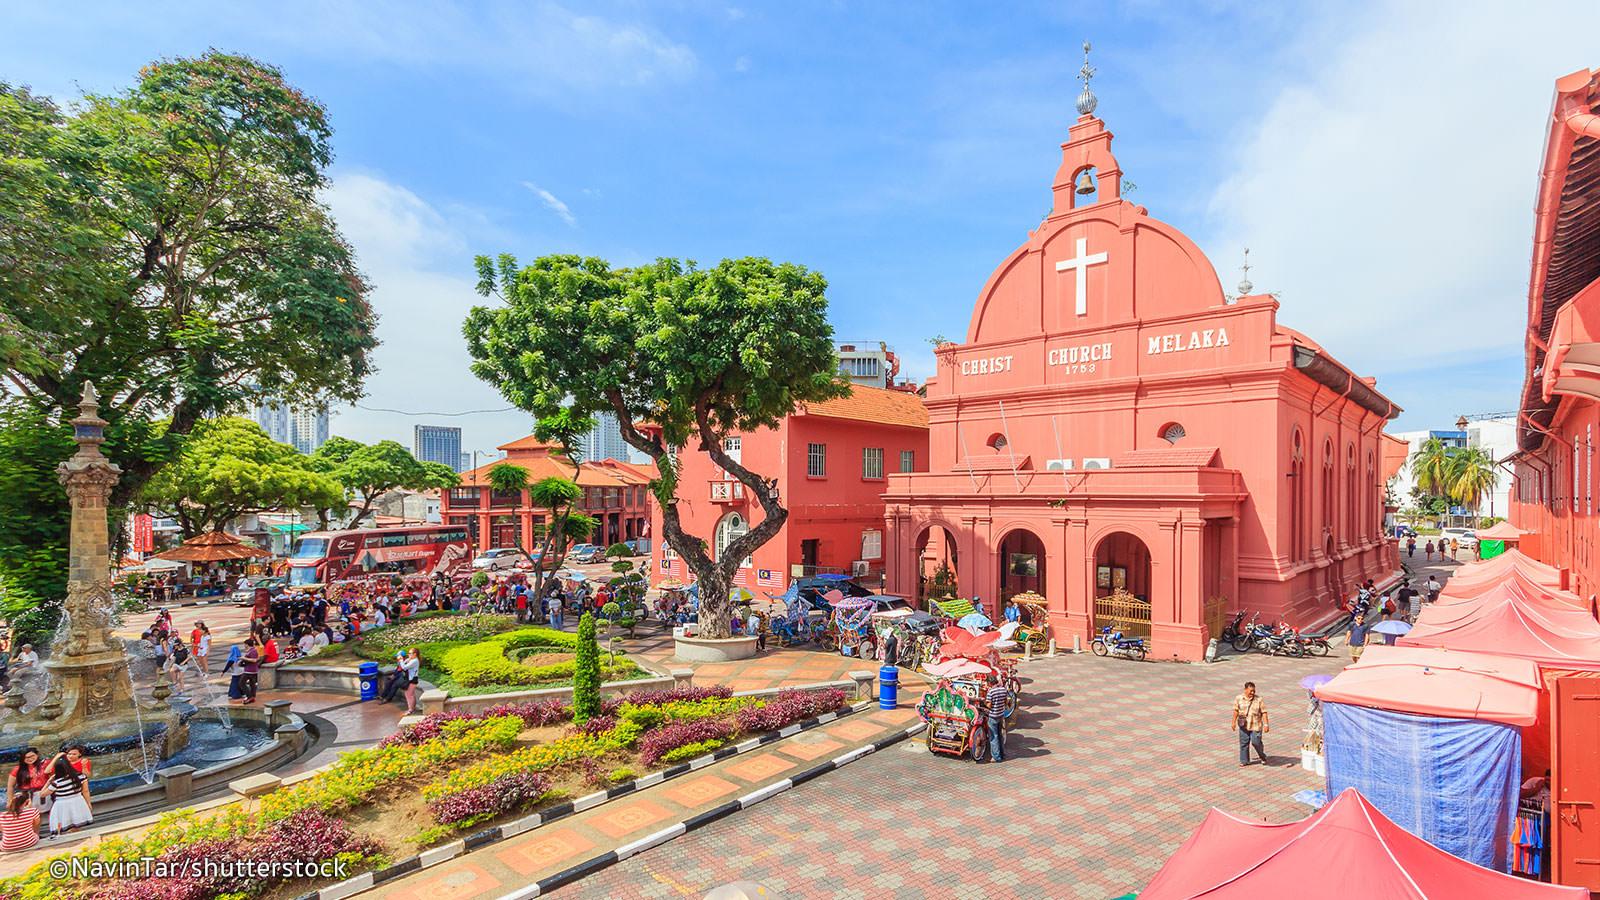 TOUR 2 NEGARA - 4D SINGAPORE MALAYSIA HARMONY - 13 JUL / 12 AUG 2020